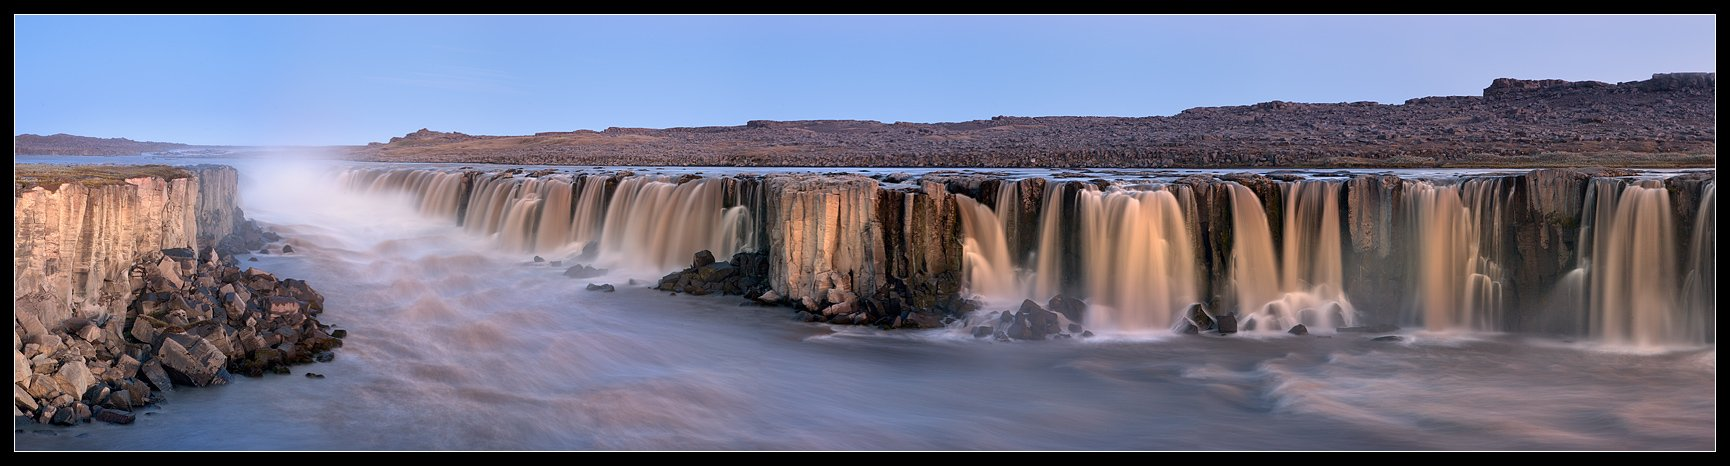 исландия, водопад, Виктория Роготнева